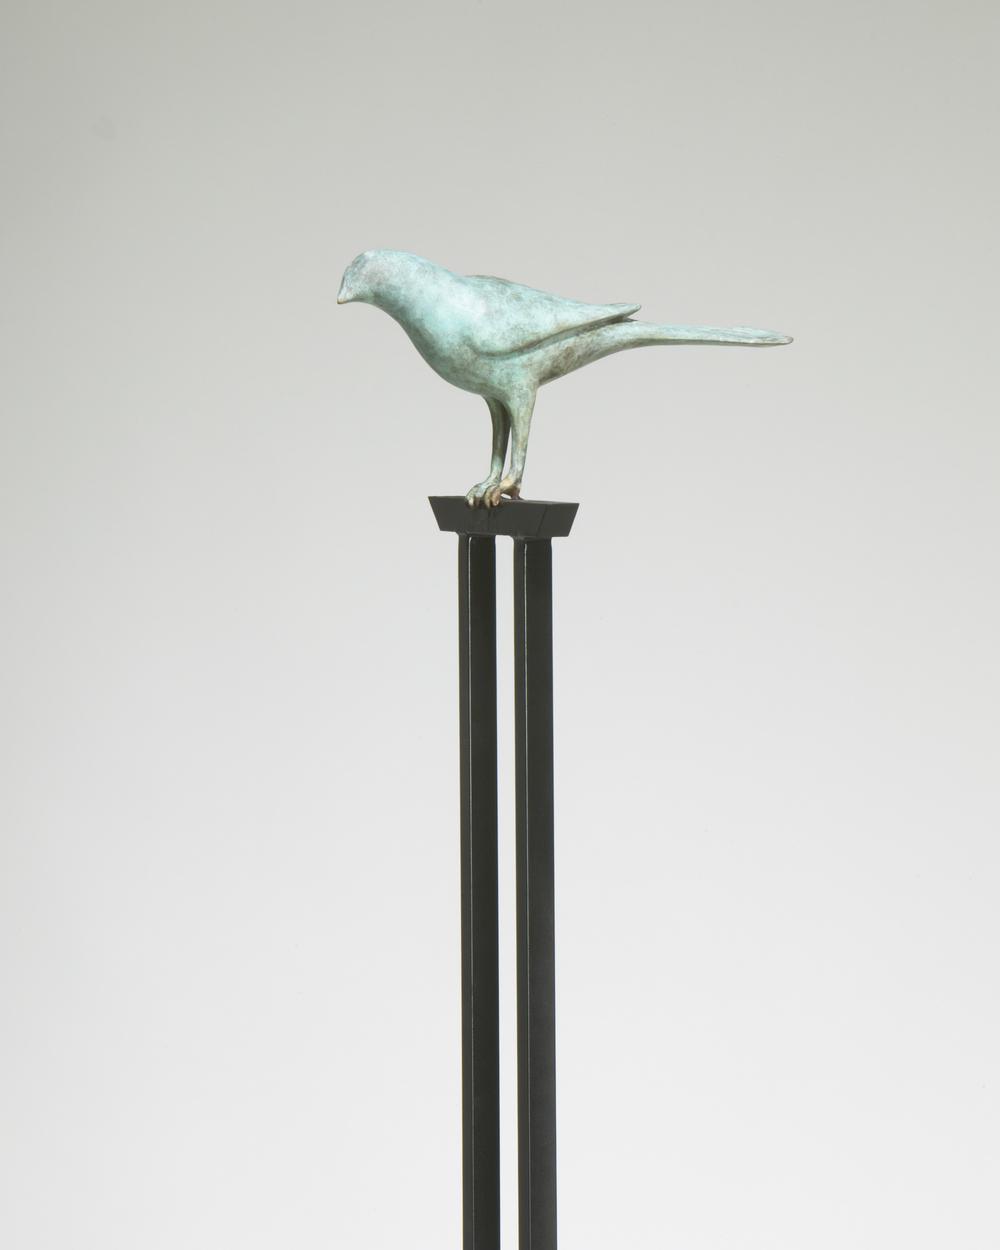 Single Bird (detail)